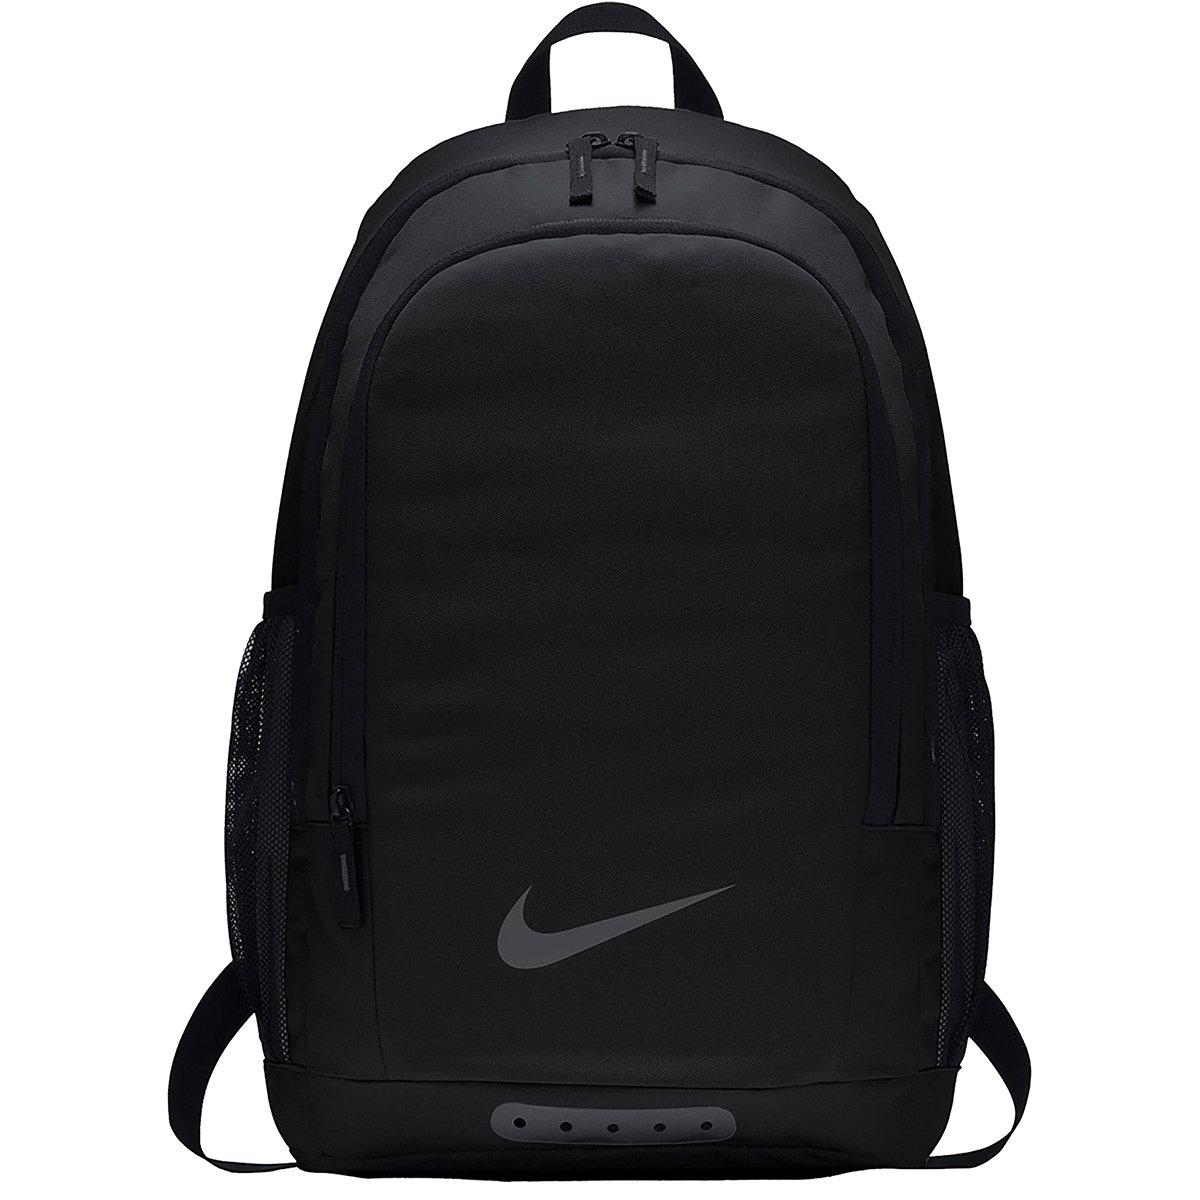 Nike Academy Soccer Backpack 51x30,5x20,5 cm black ca.32L